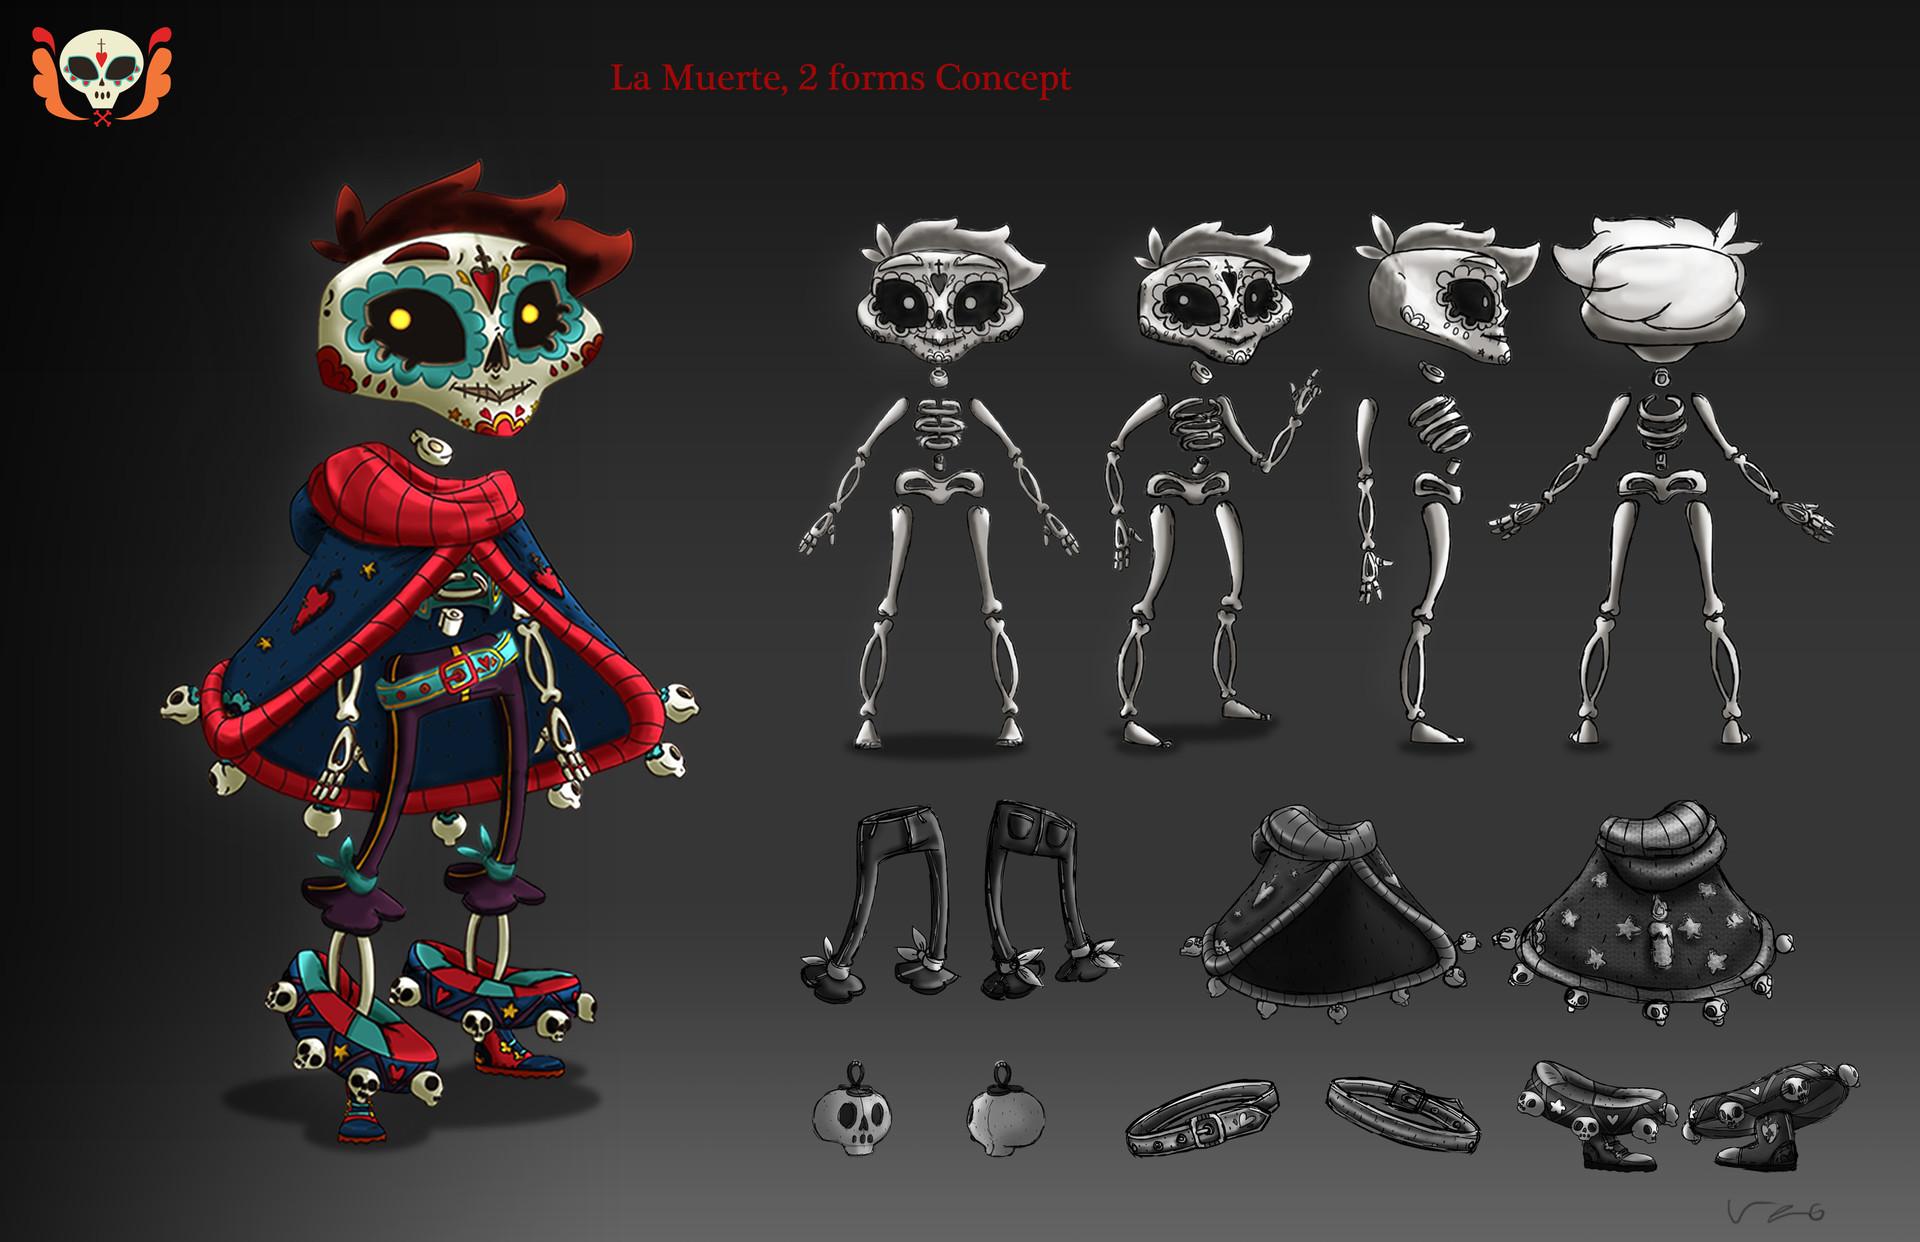 Character Design Courses University : Veronique bellavance skull and toon 2015